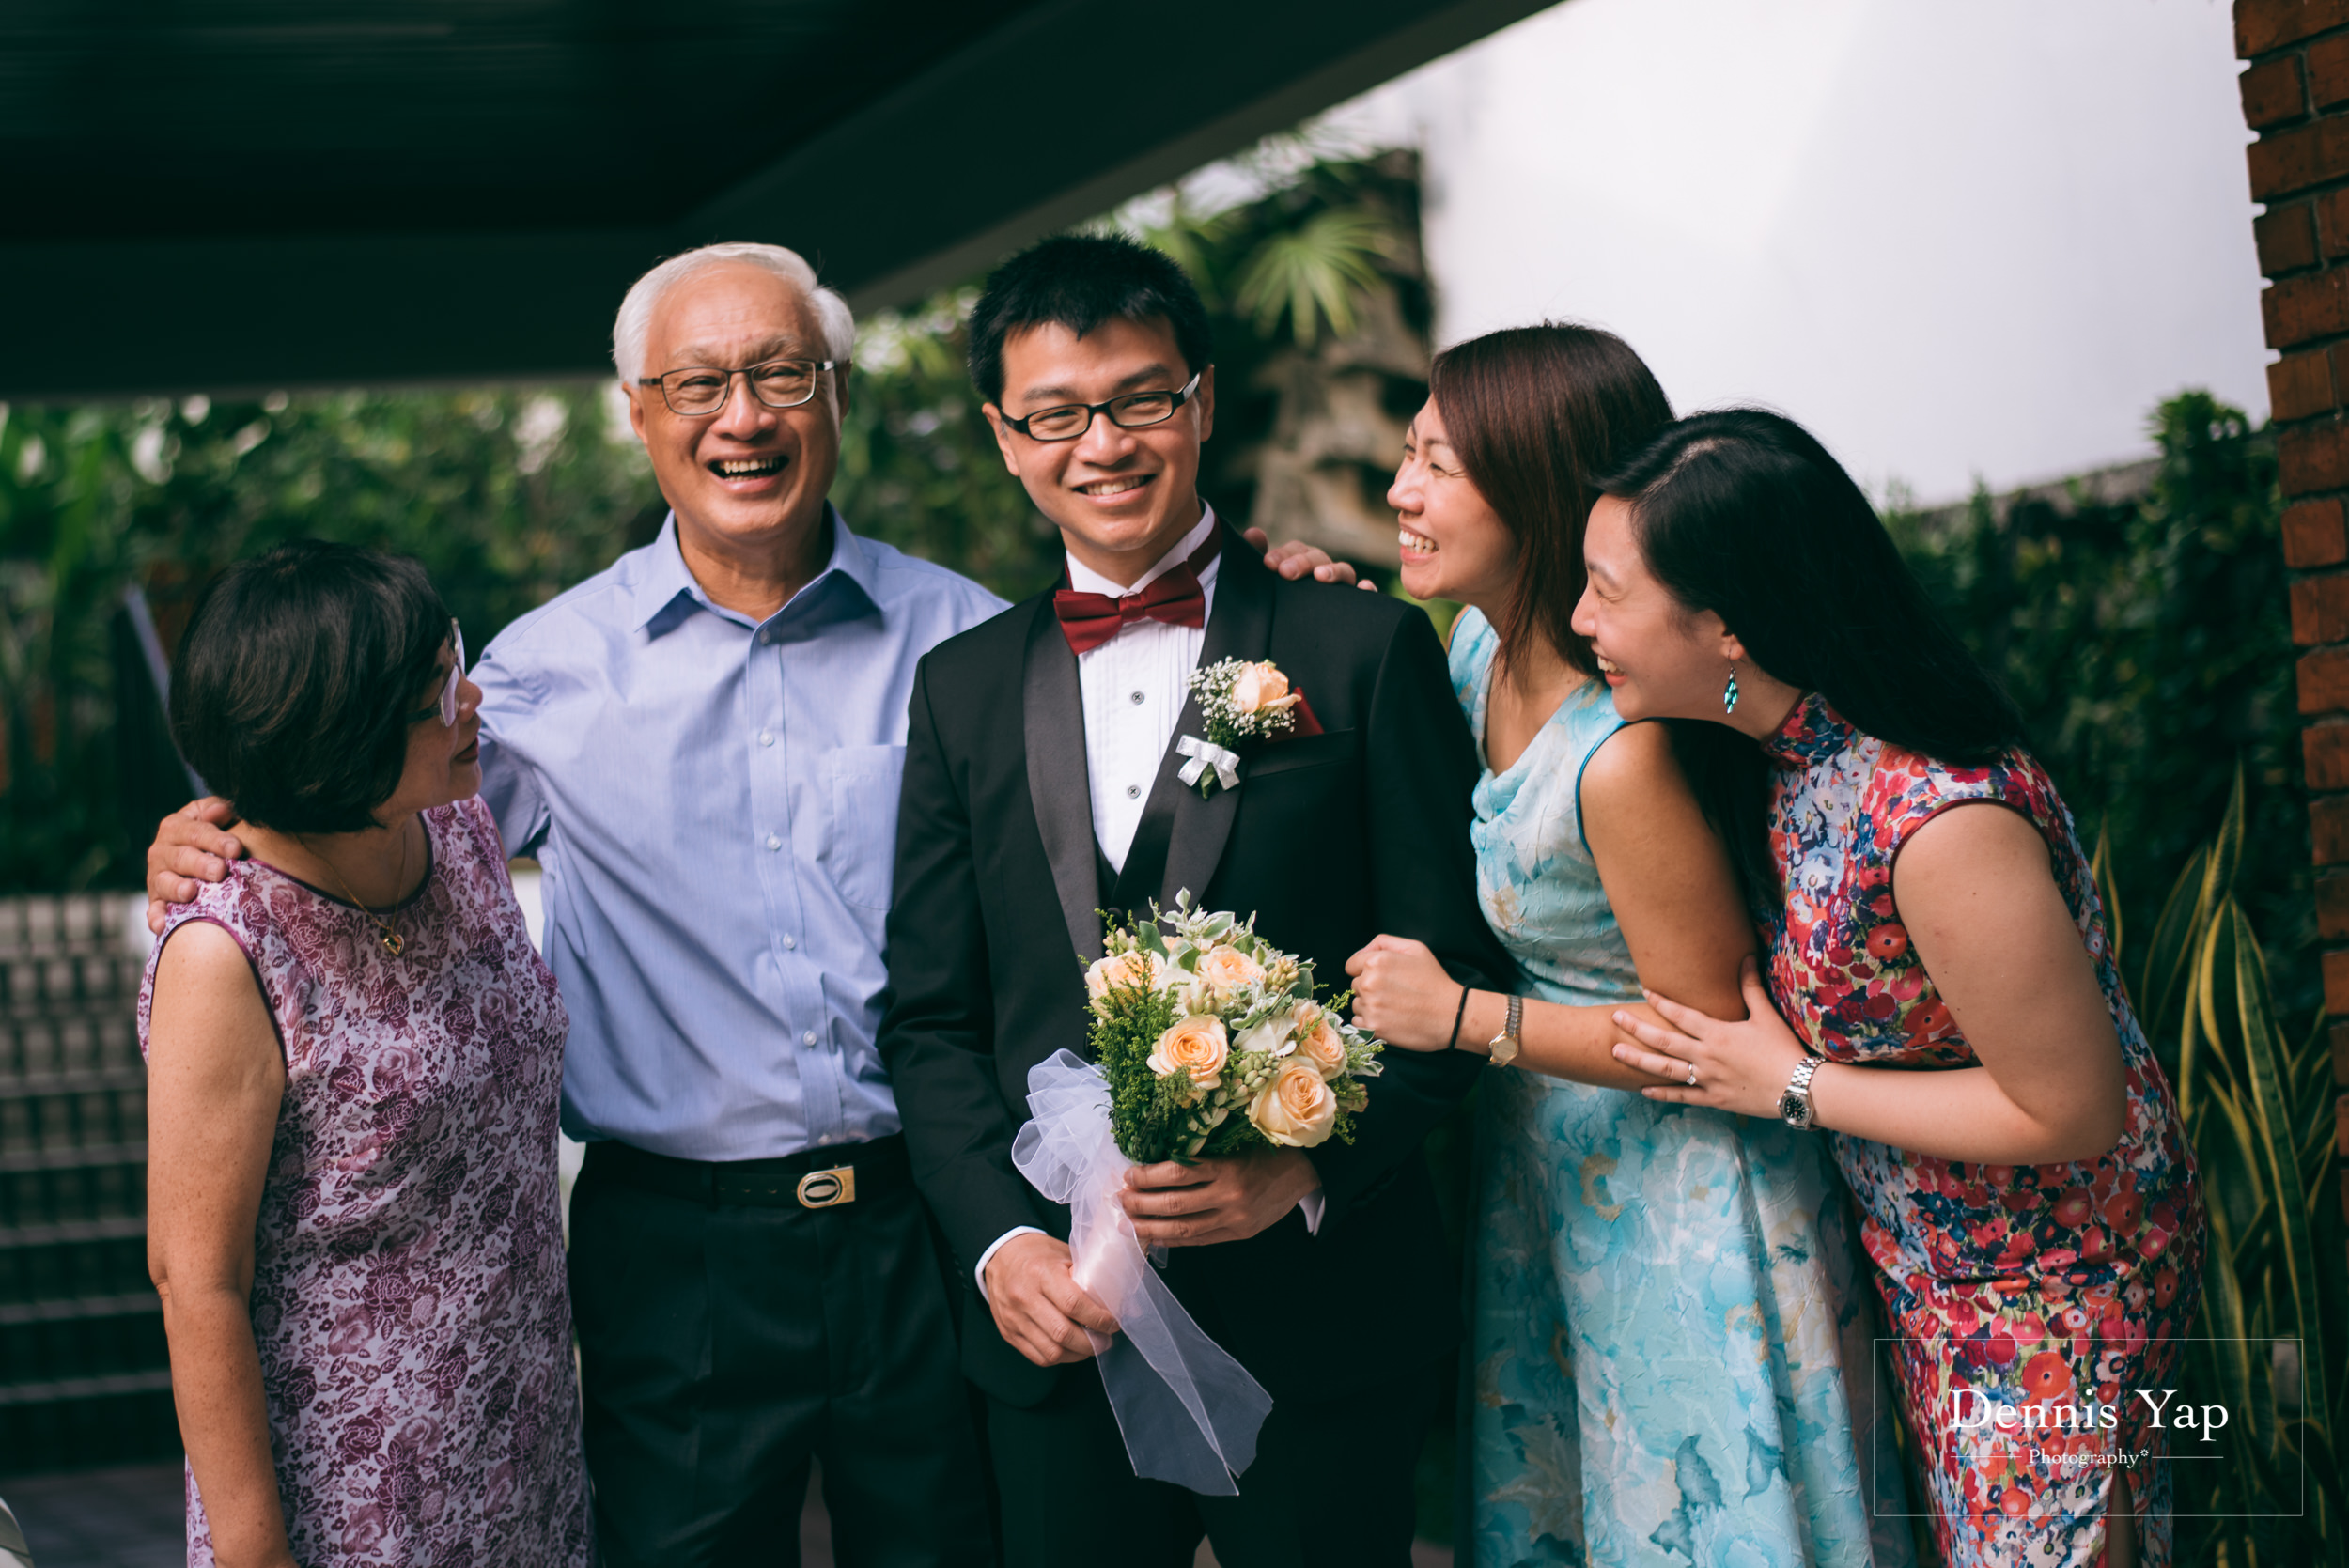 wai keong jenny wedding day bangsar dennis yap photography emotions beloved family-3.jpg